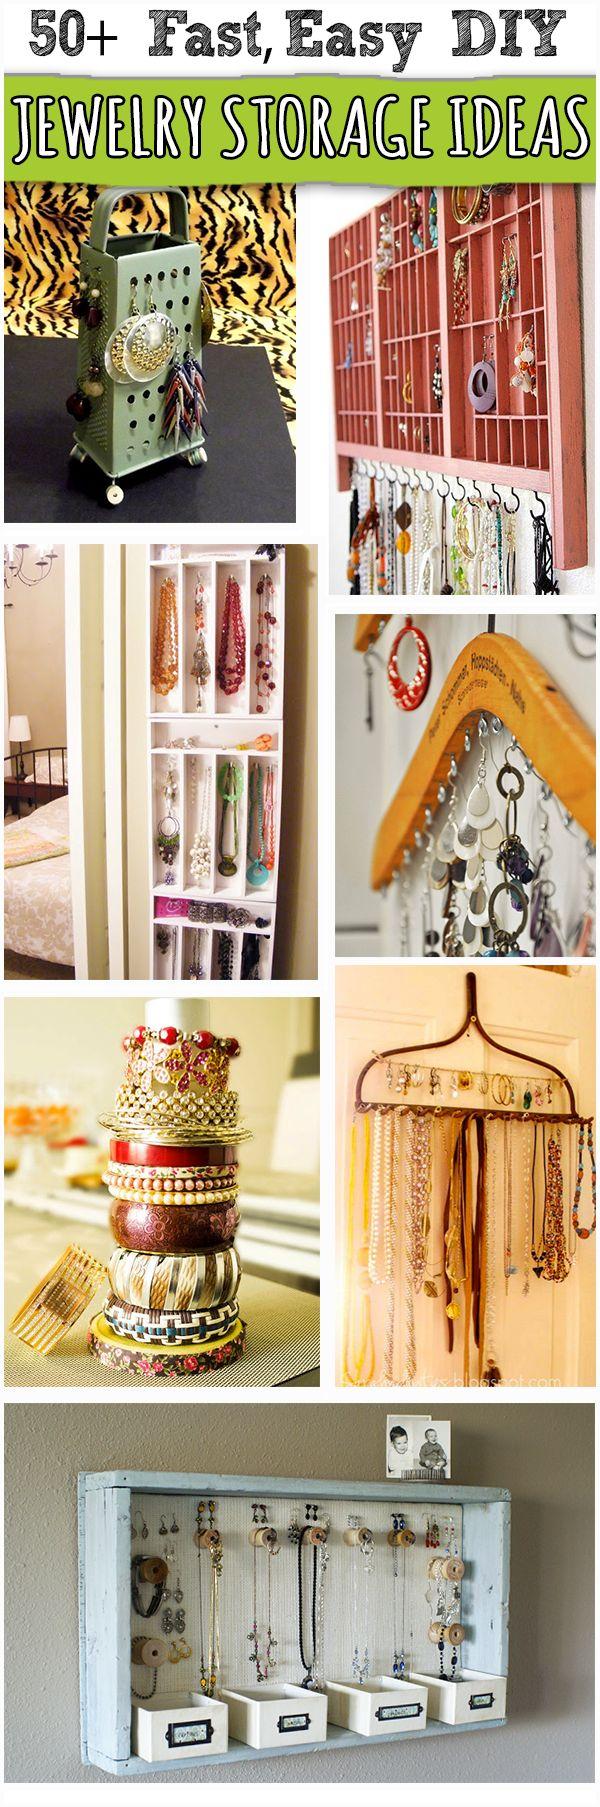 Over 50+ Creative DIY Jewelry Storage, Organization